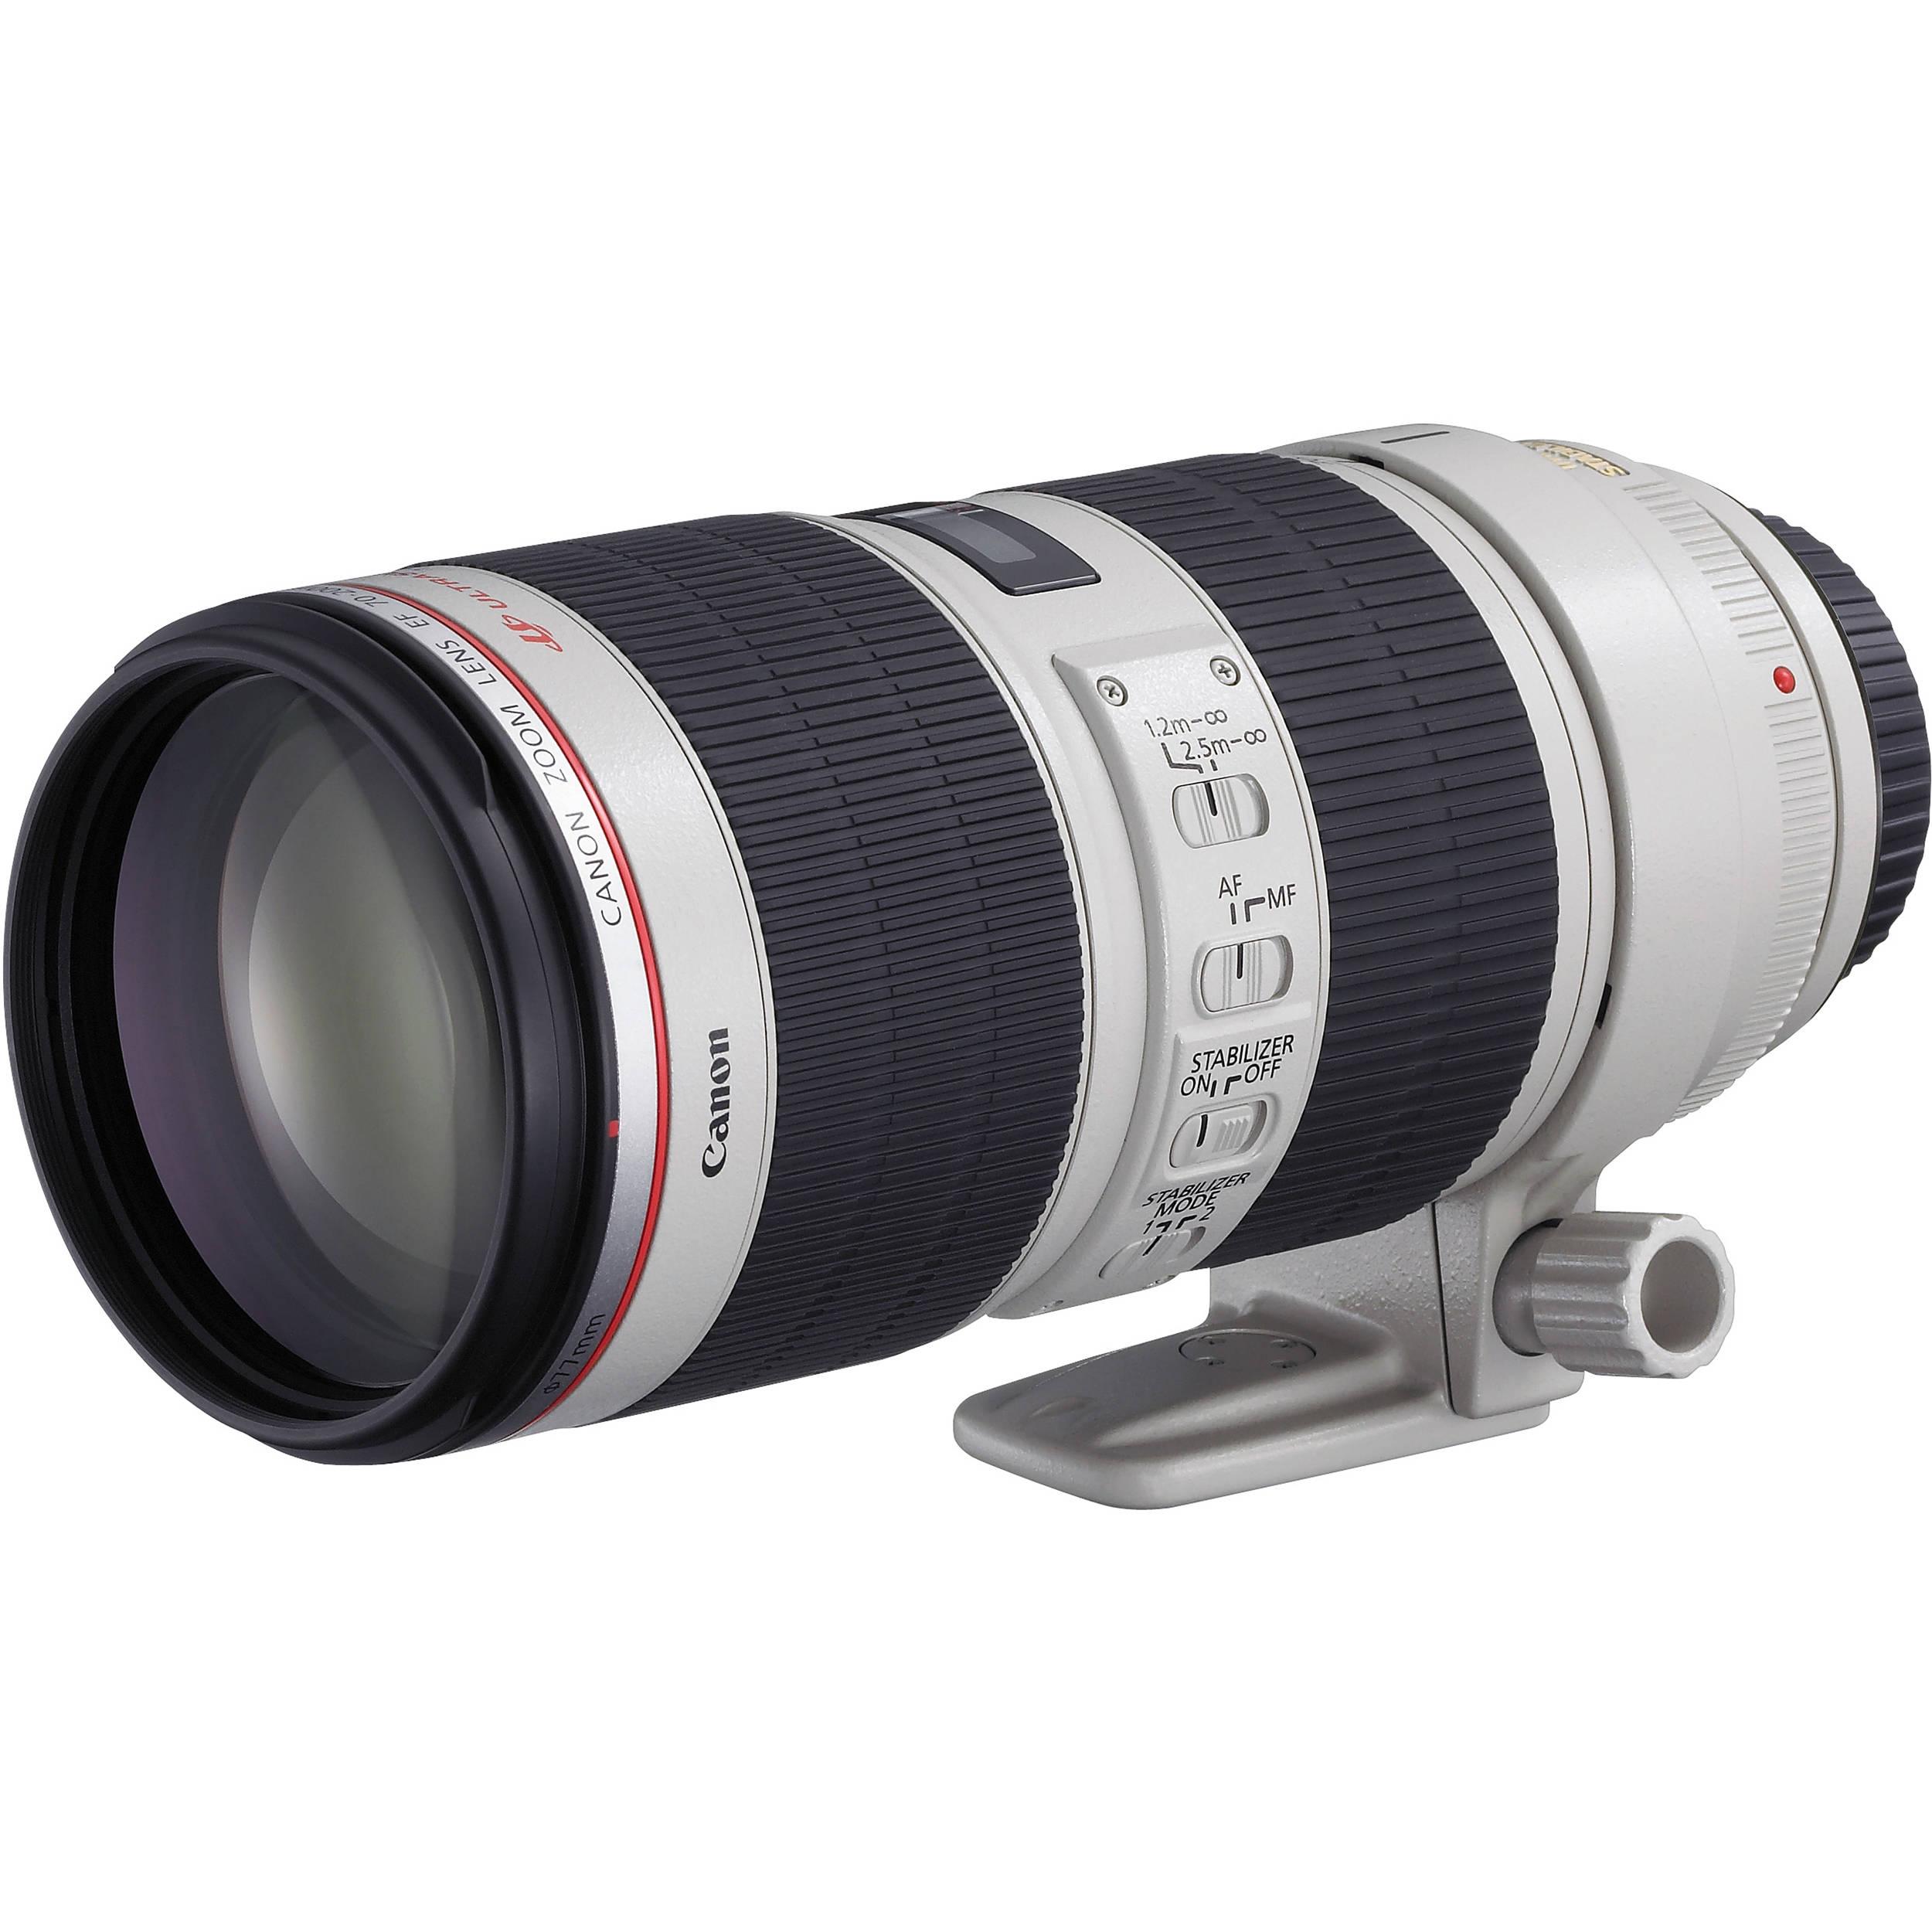 Canon-EF-70-200mm-f2.8L-IS-II-USM.jpg